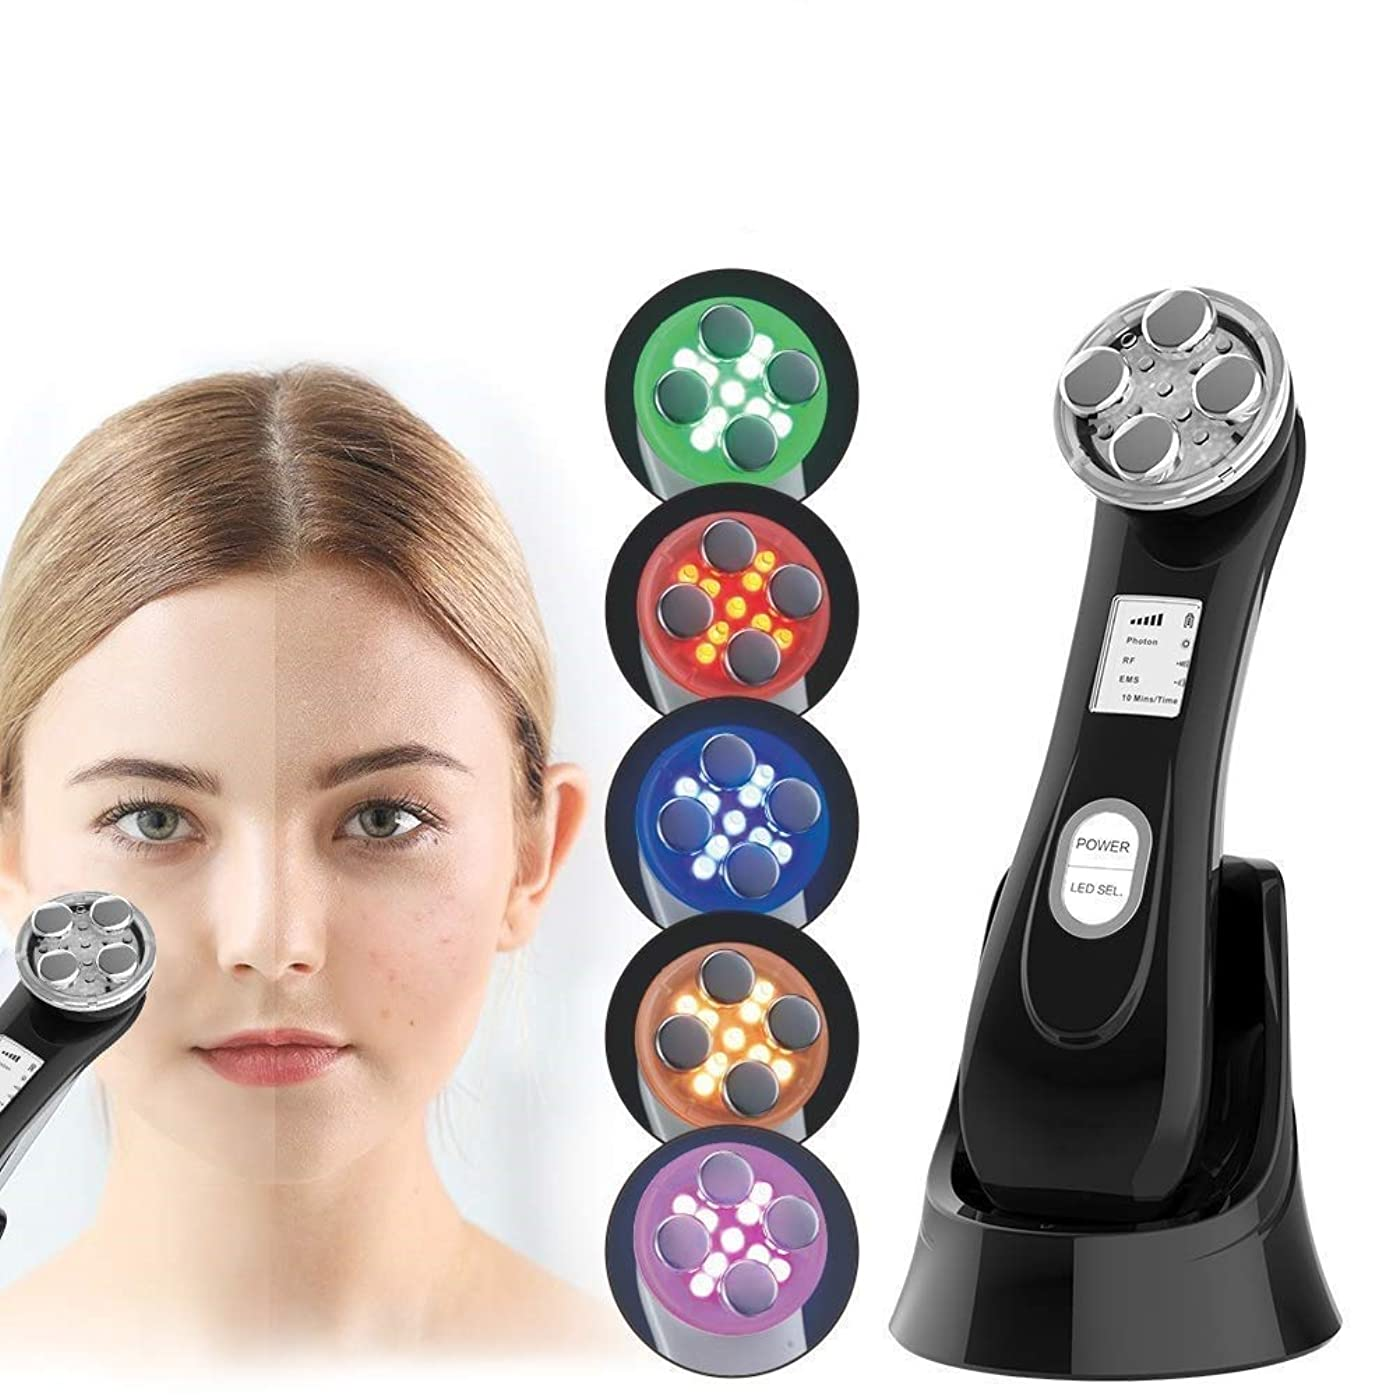 1 RF美容アンチエイジングアンチにきび顔の引き締めリフティング美容機高周波usb充電式に付き超音波美容機器6